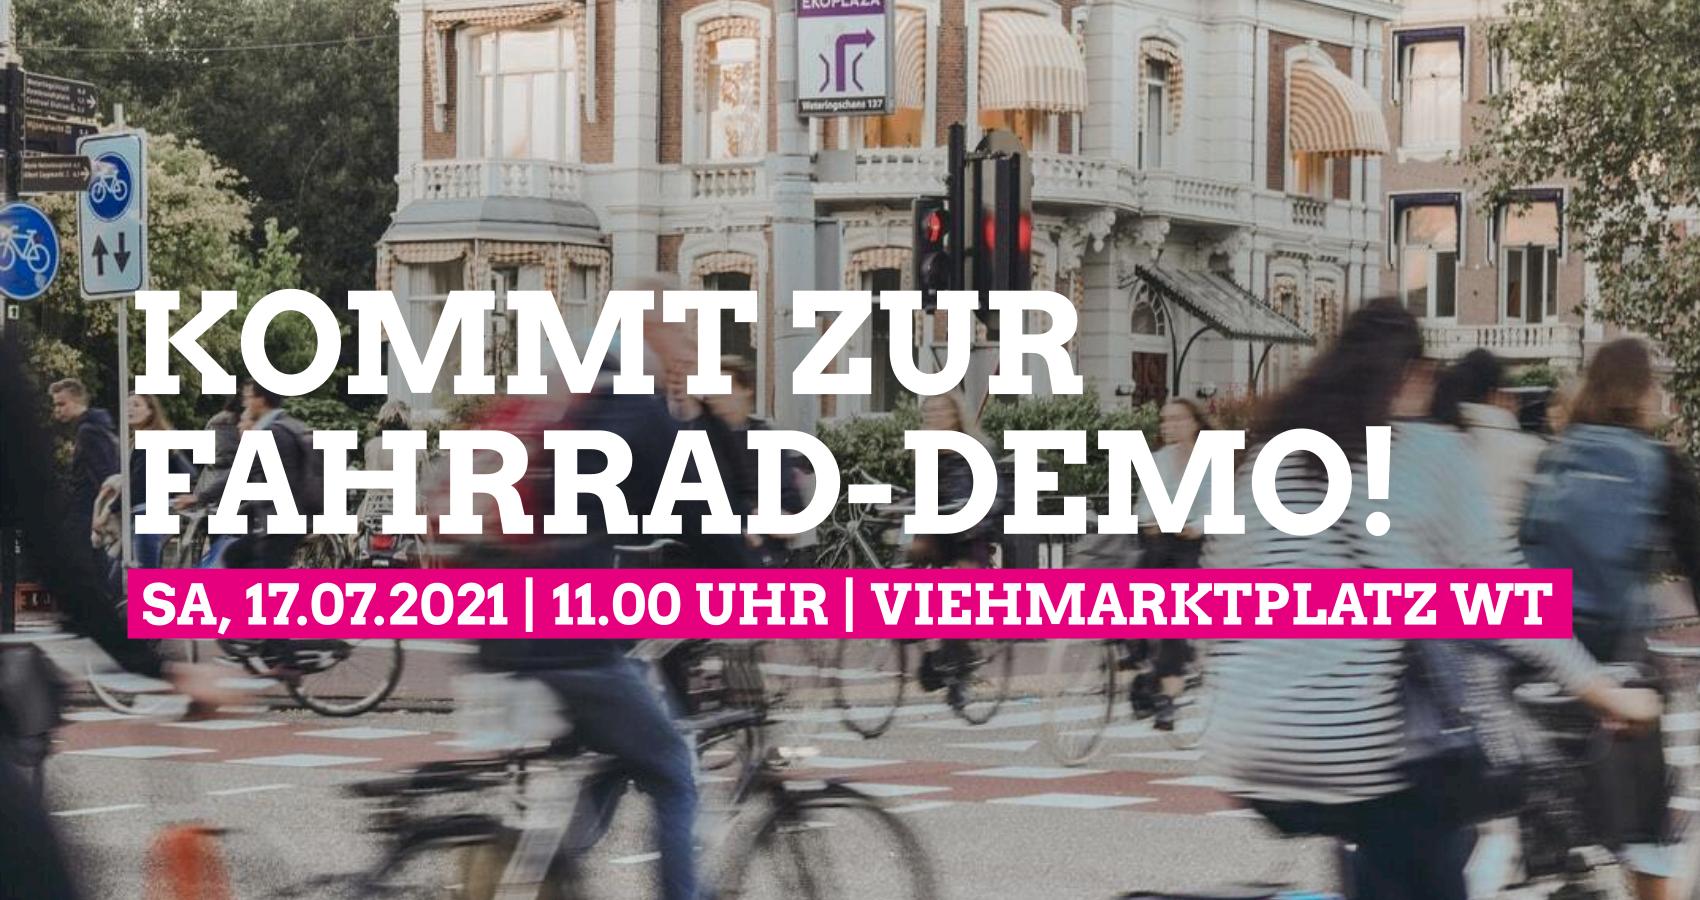 Fahrrad-Demo in Waldshut am 17.07.2021